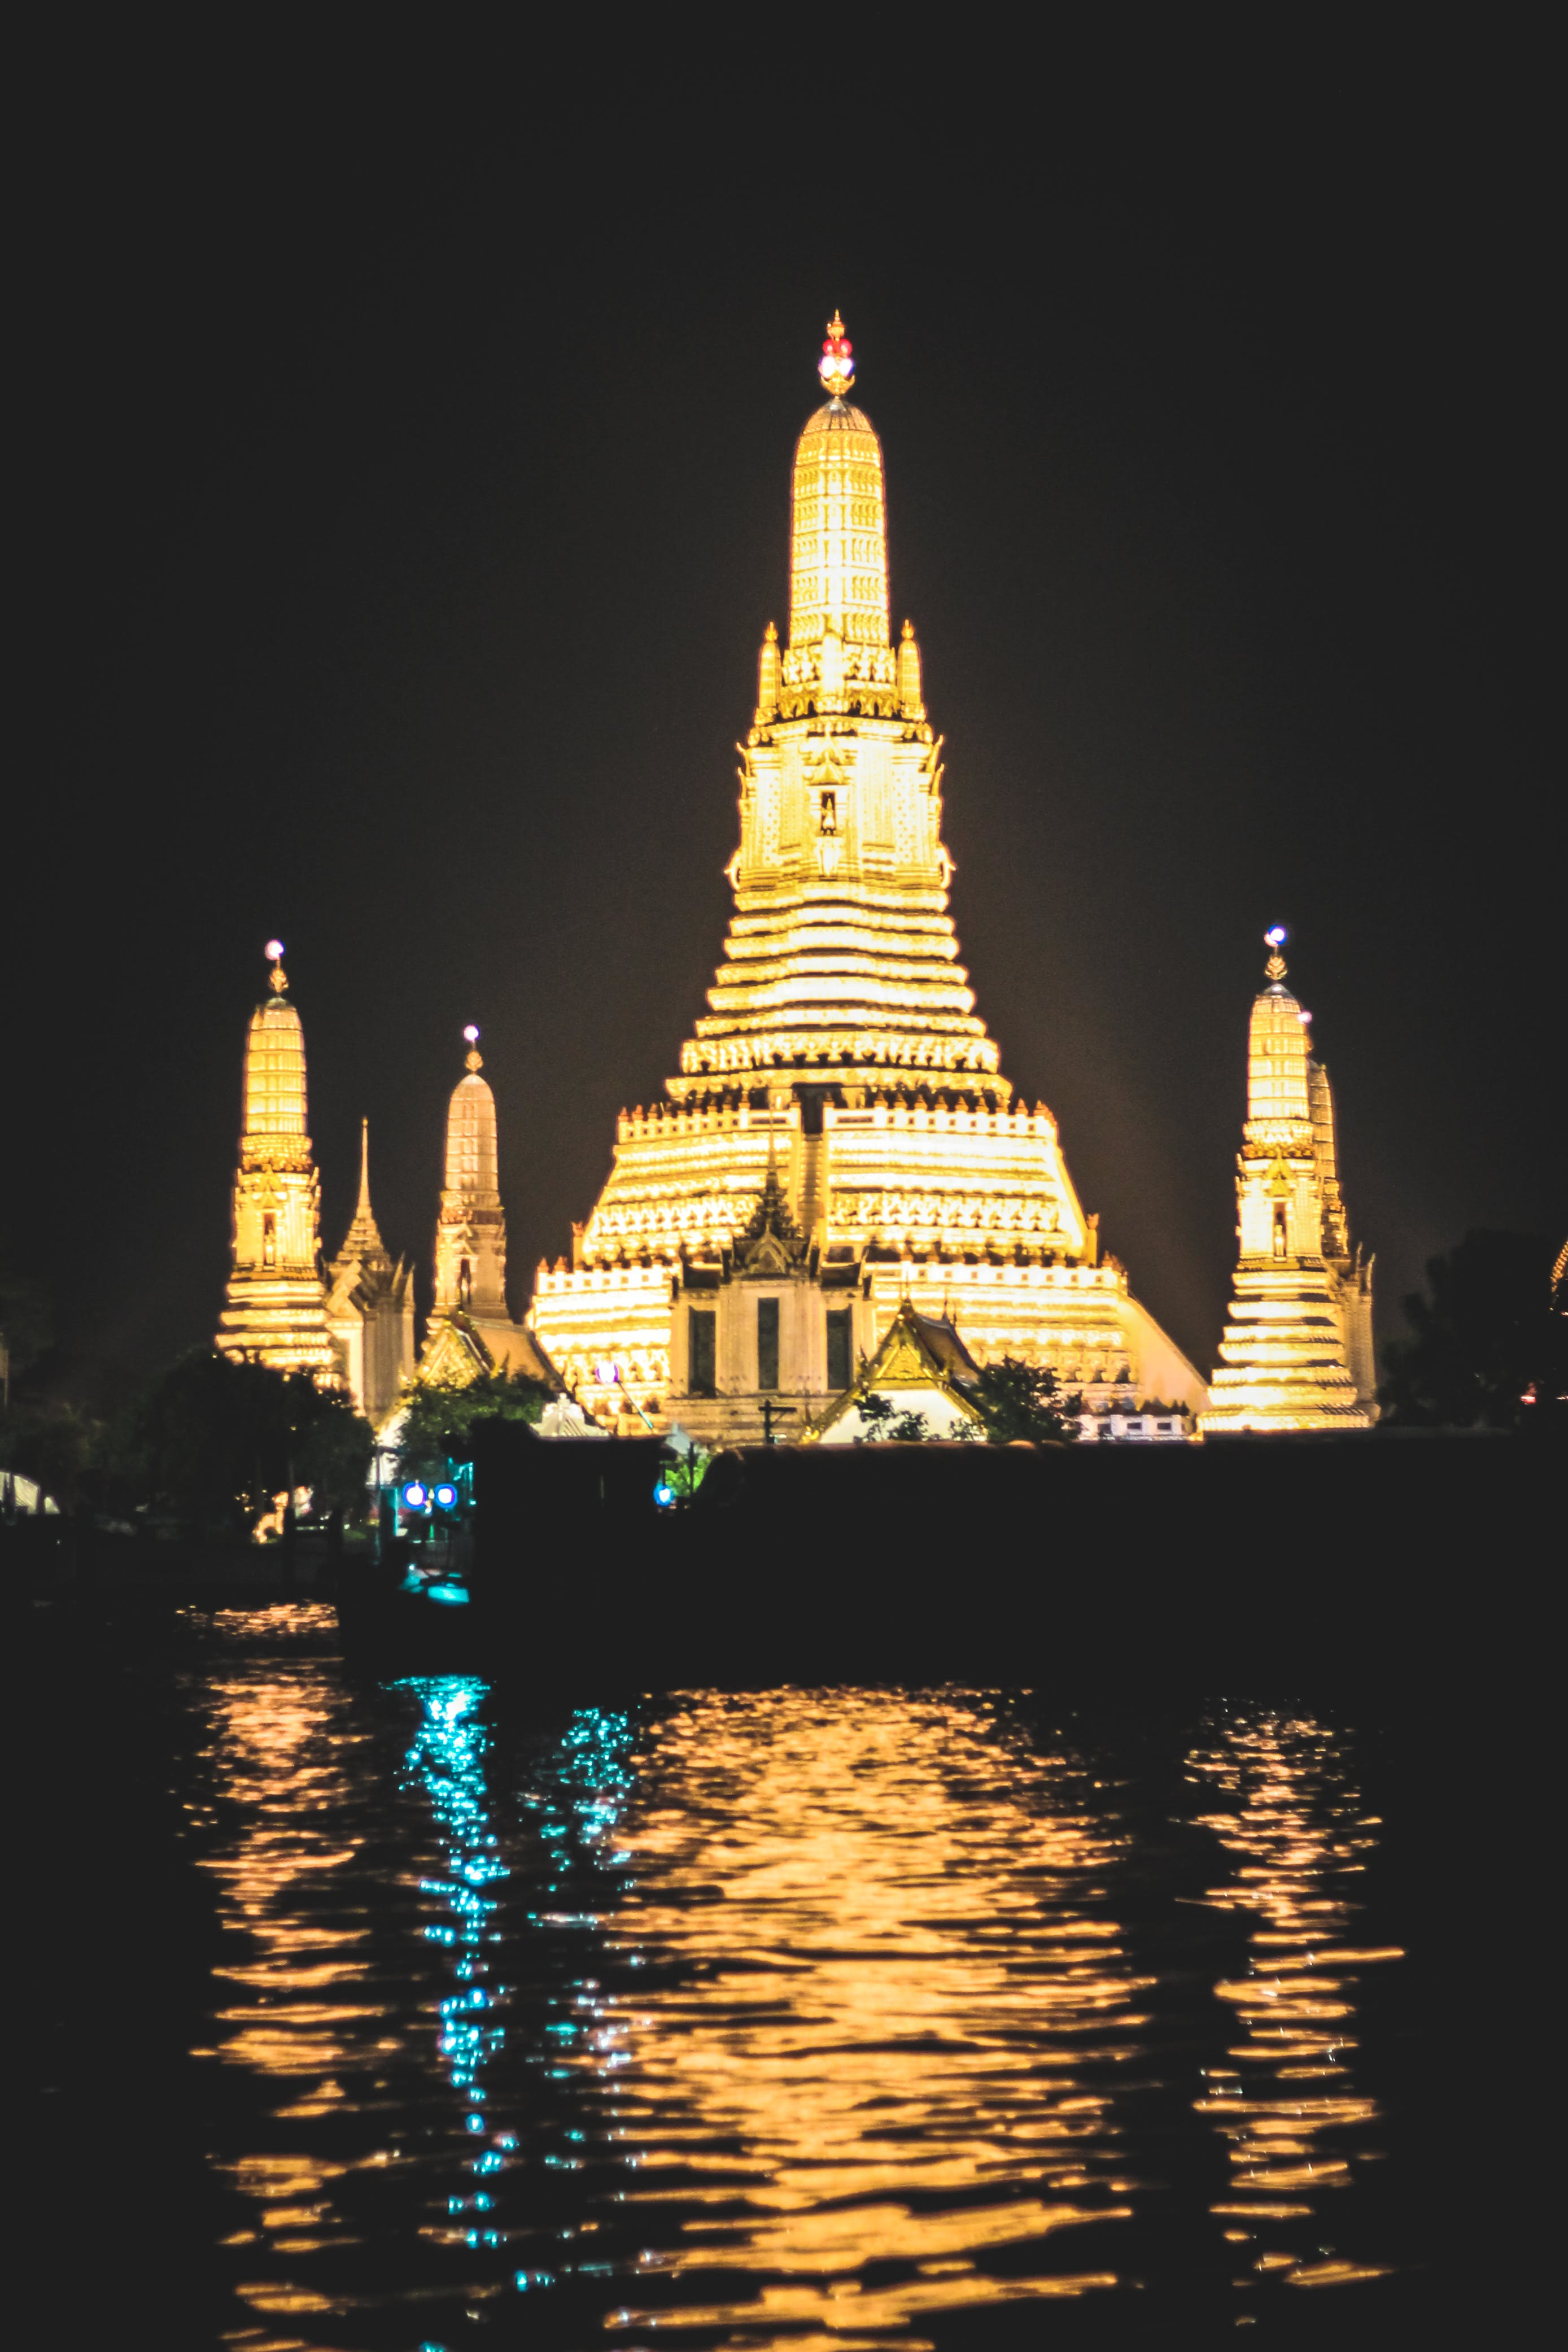 Kostenloses Stock Foto zu abenteuer, ali madad, architektur, bangkok